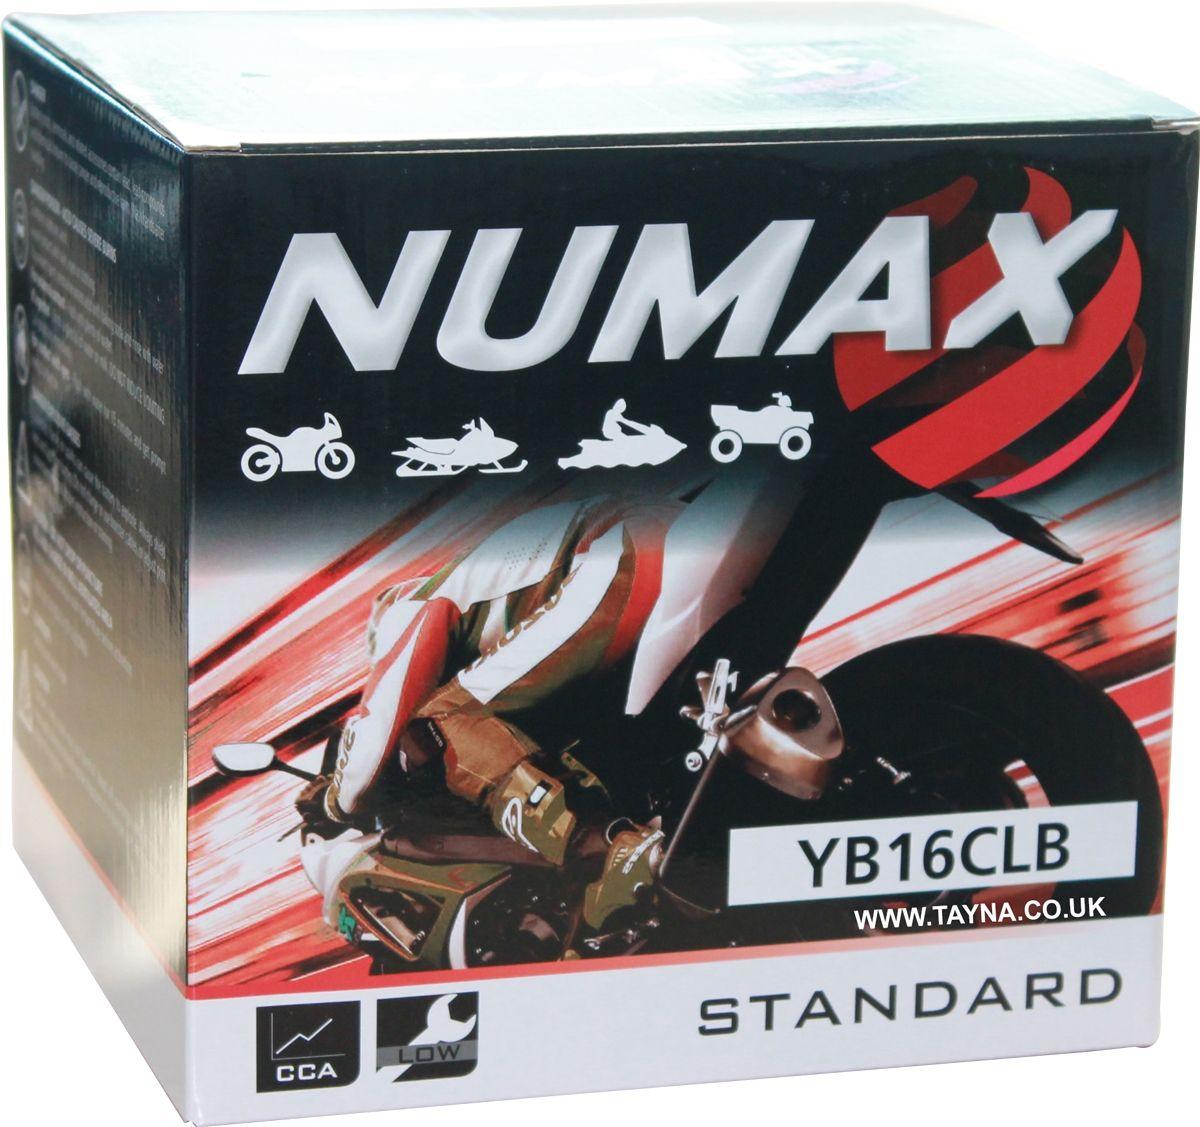 B Battery Numax B Yb16cl Motorbikejetski Yb16cl CxoedB